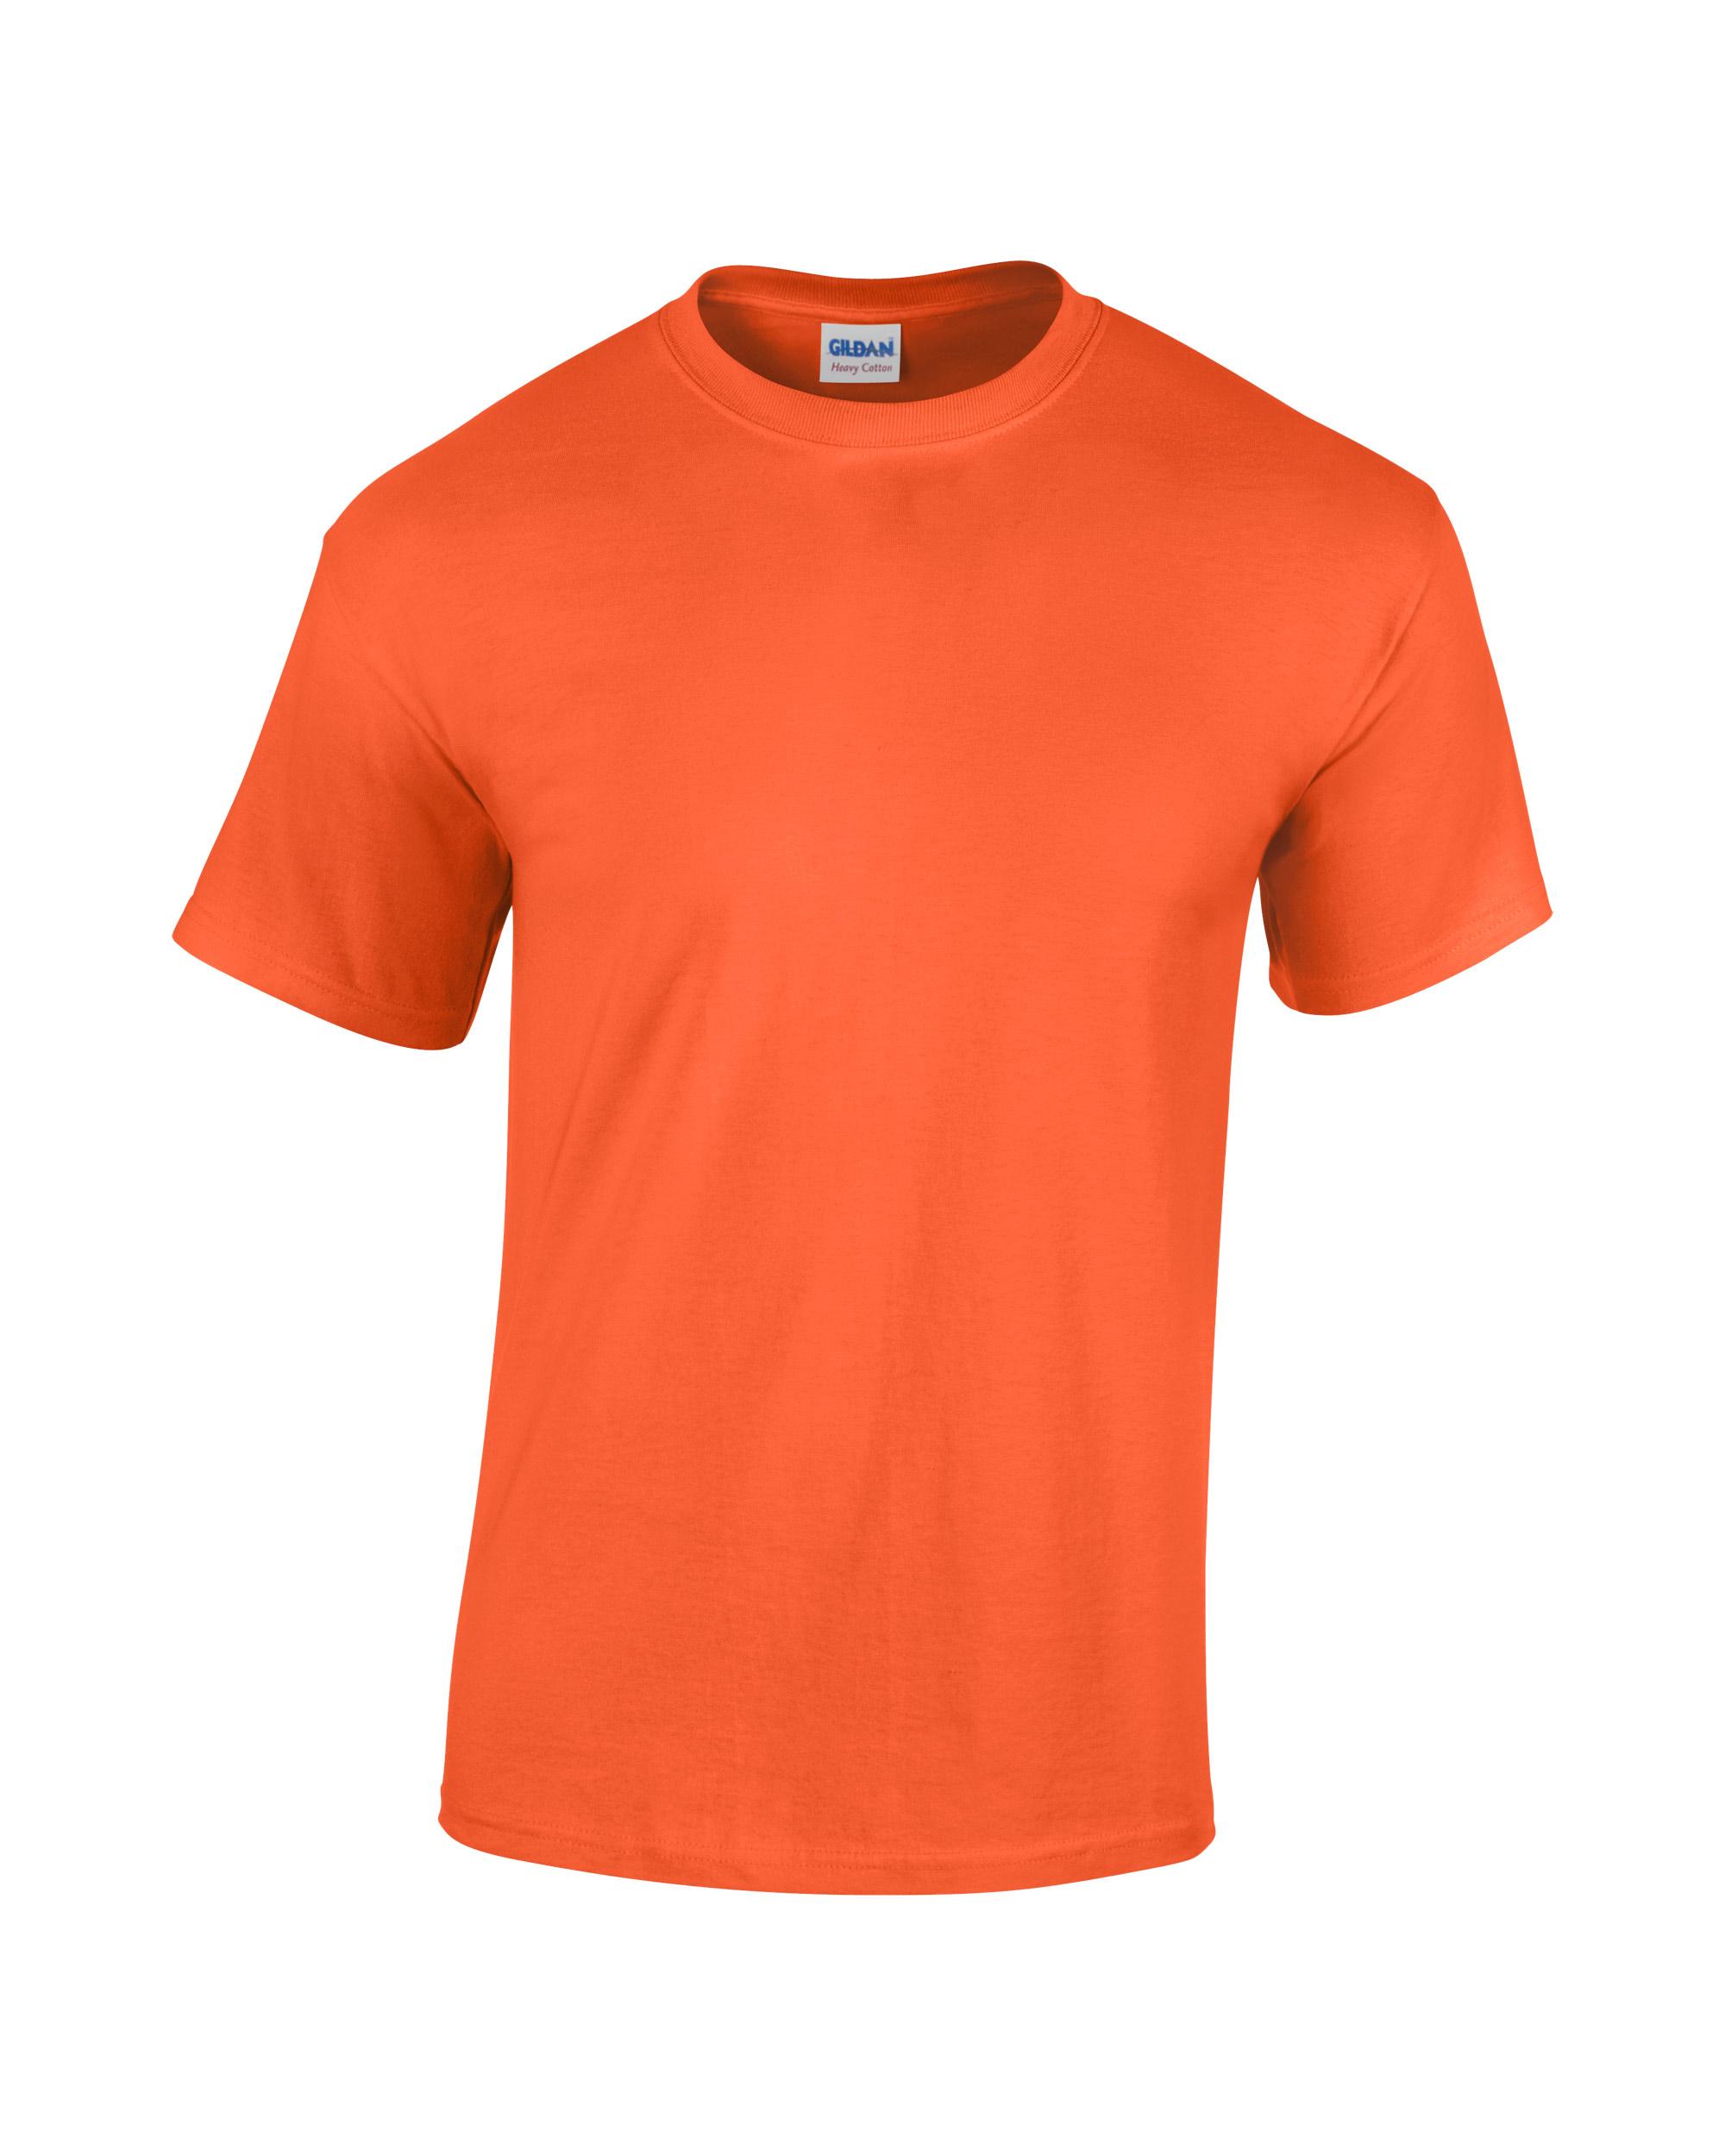 5e65db6007d Gildan 5.3 oz- heavy cotton- Unisex shirt - Team Shirt Pros